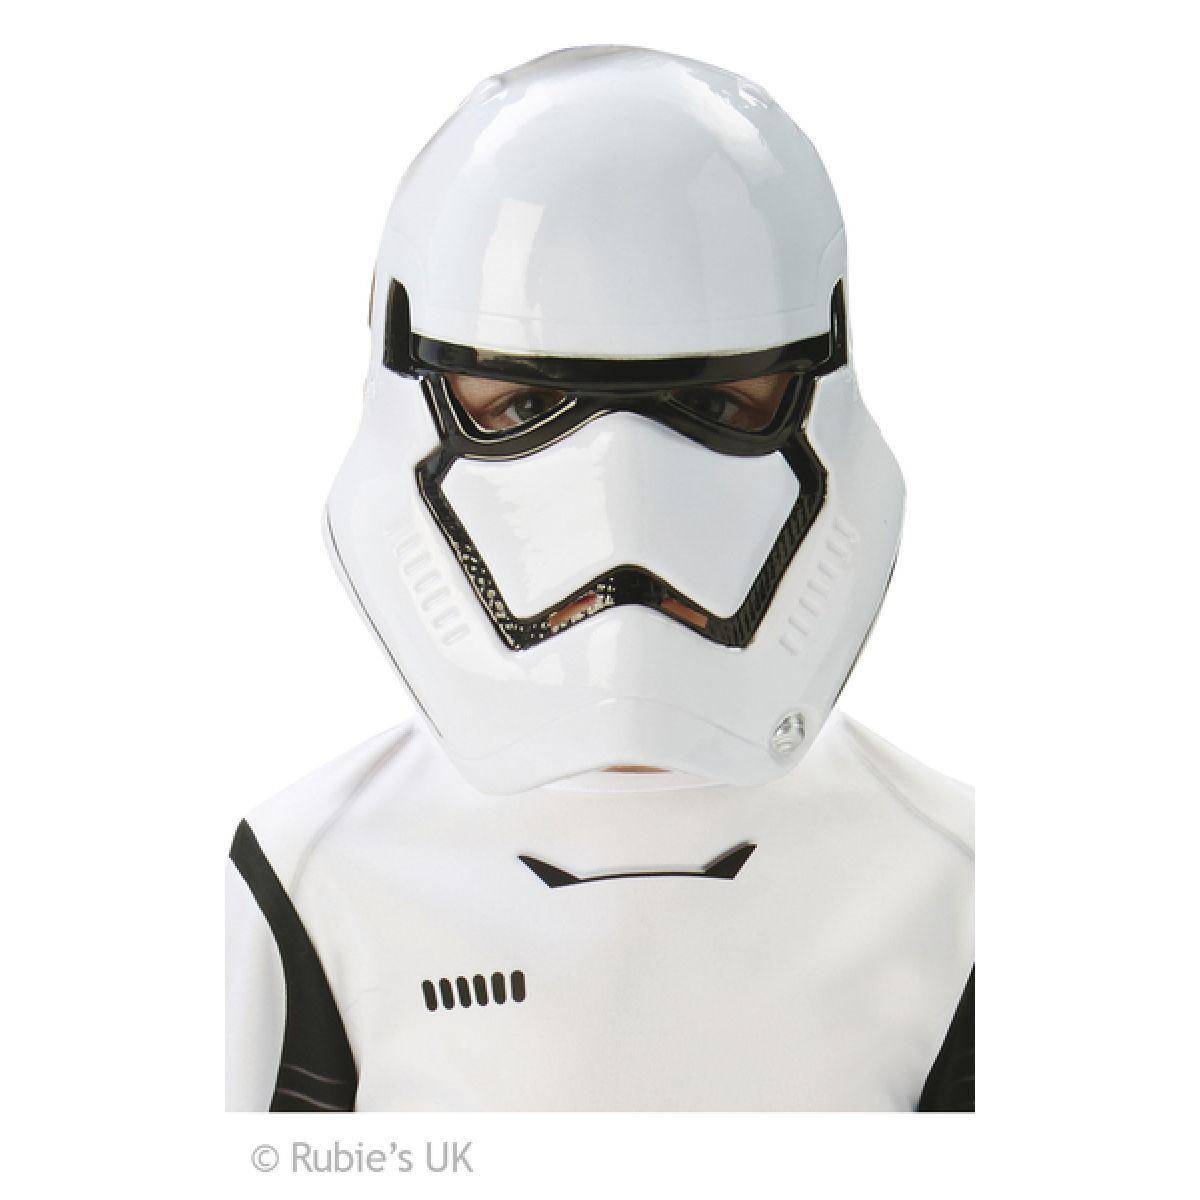 Rubie's Star Wars EP7 Stormtrooper maska plast